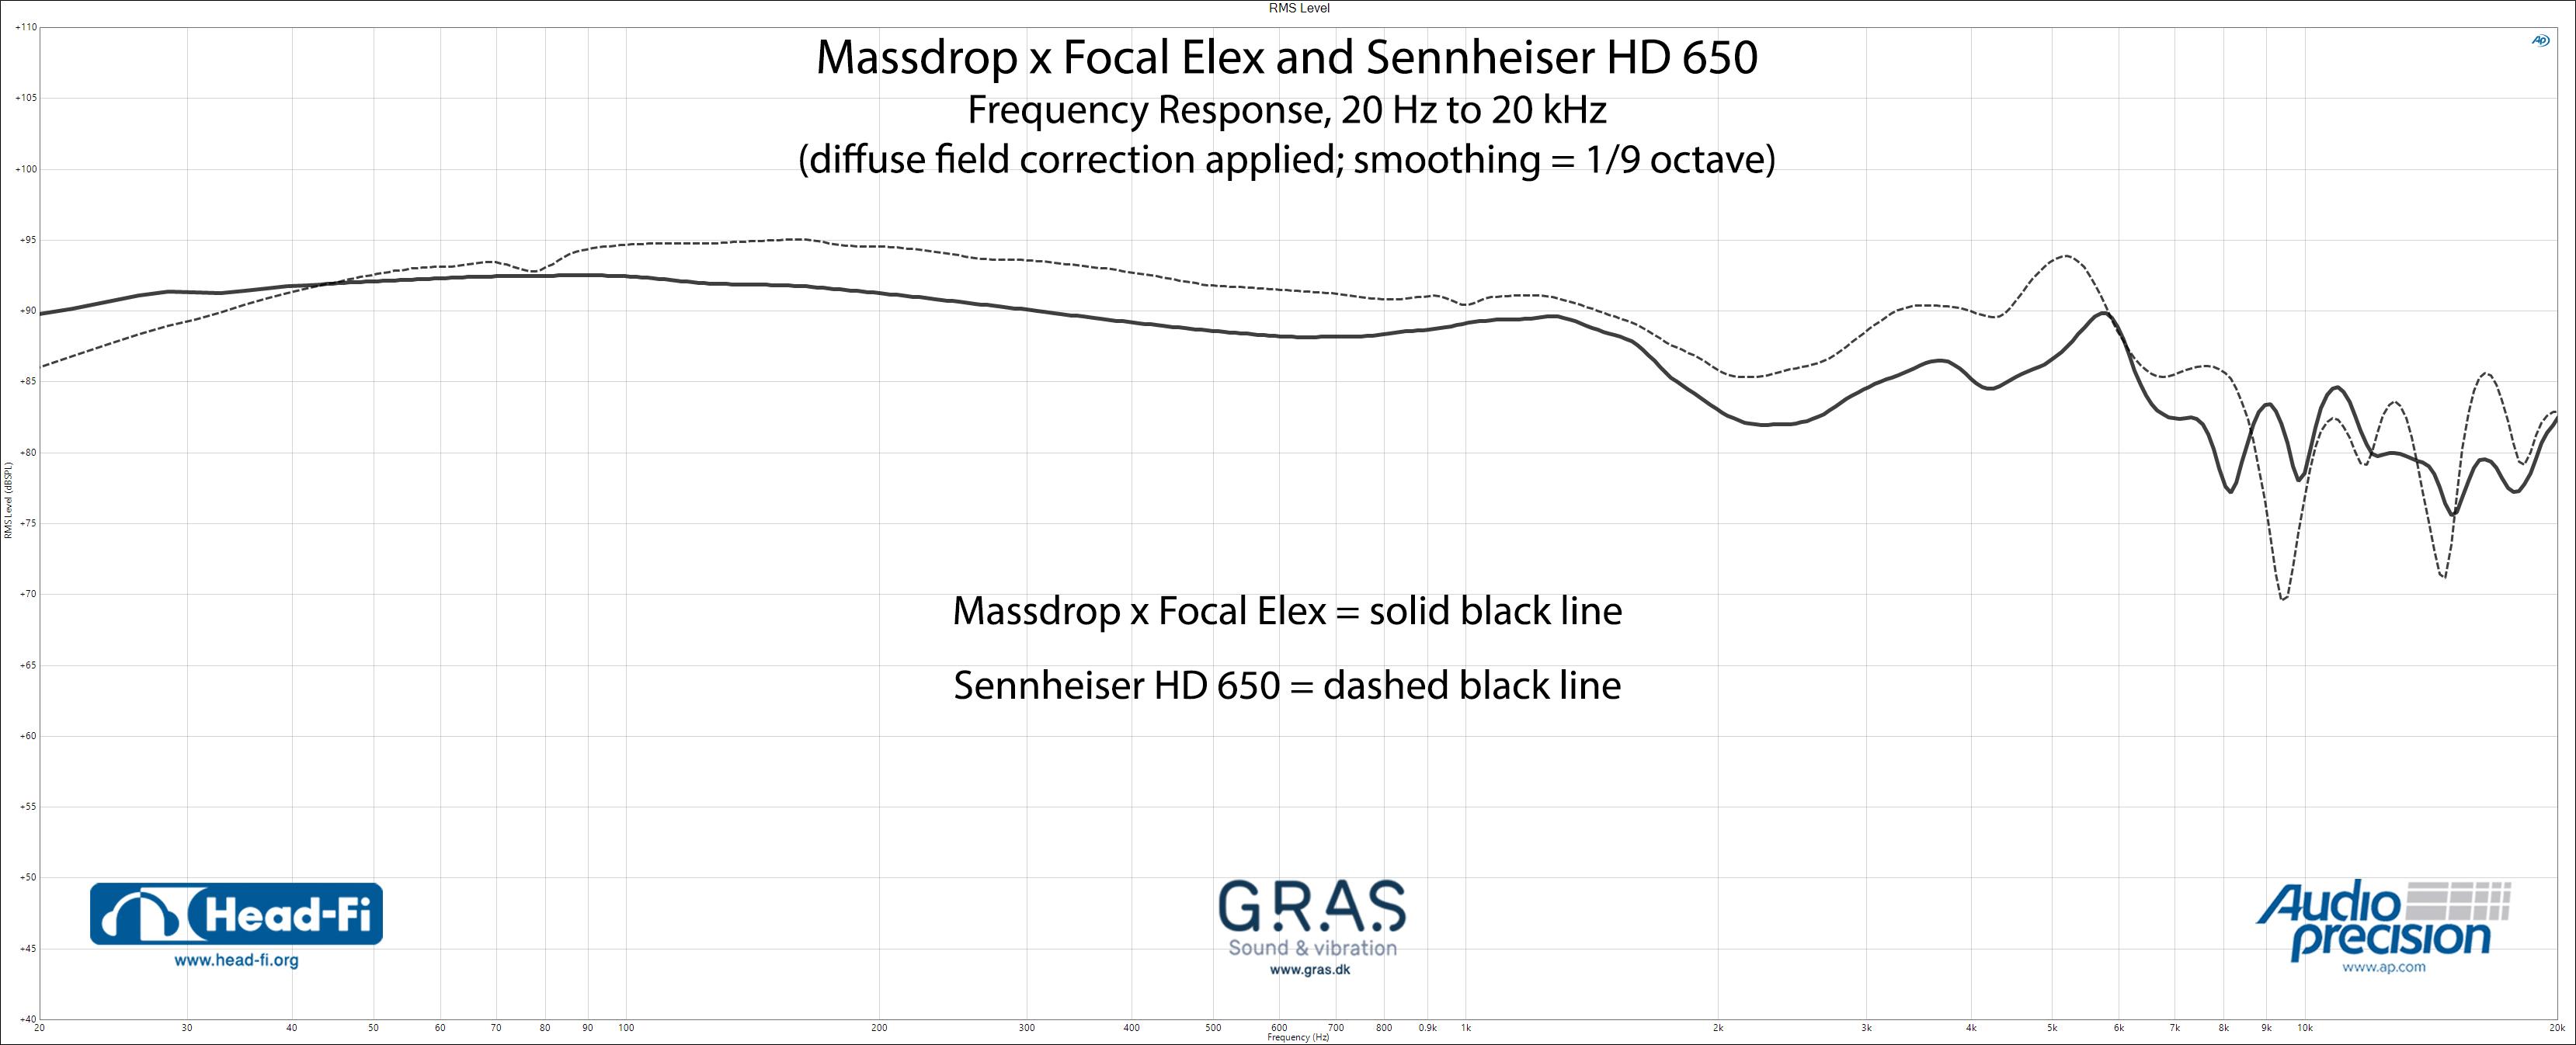 RMS-Level_1-9_DF_Massdrop-x-Focal-Elex_Sennheiser-HD650.jpg